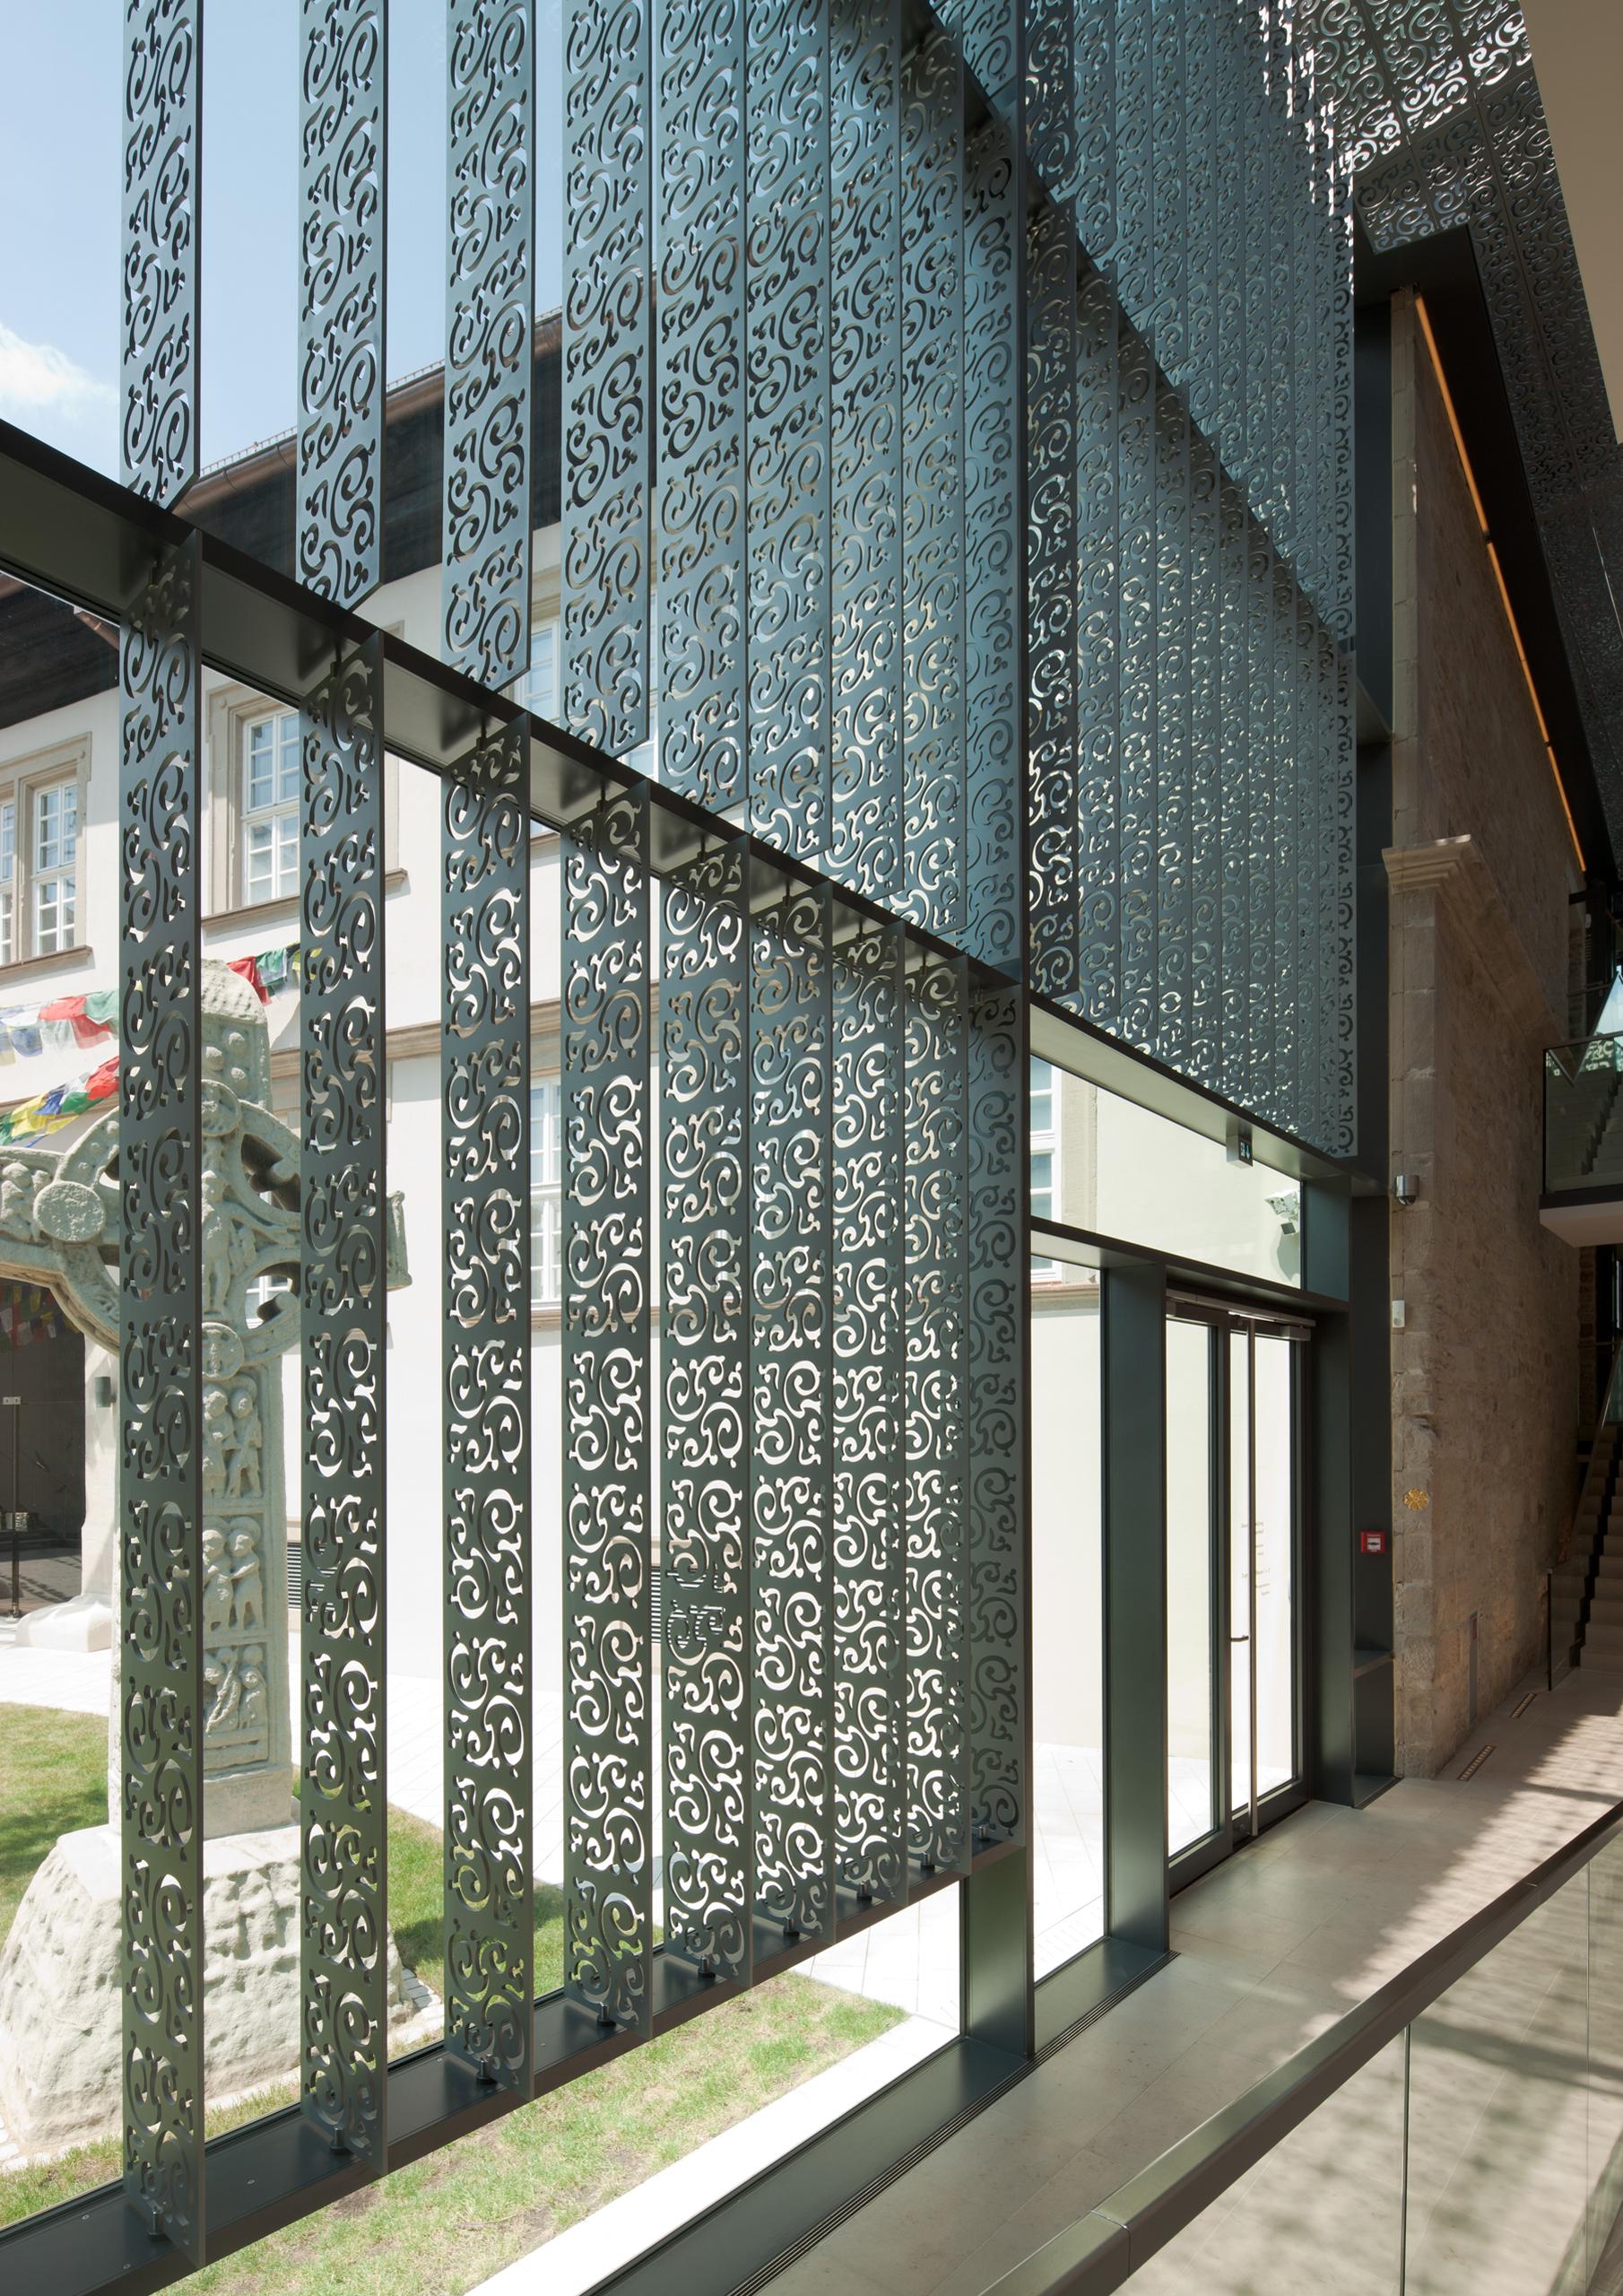 https://www.architektur-fassade.de/wp-content/uploads/2021/02/08509_KnaufMuseum02.jpg